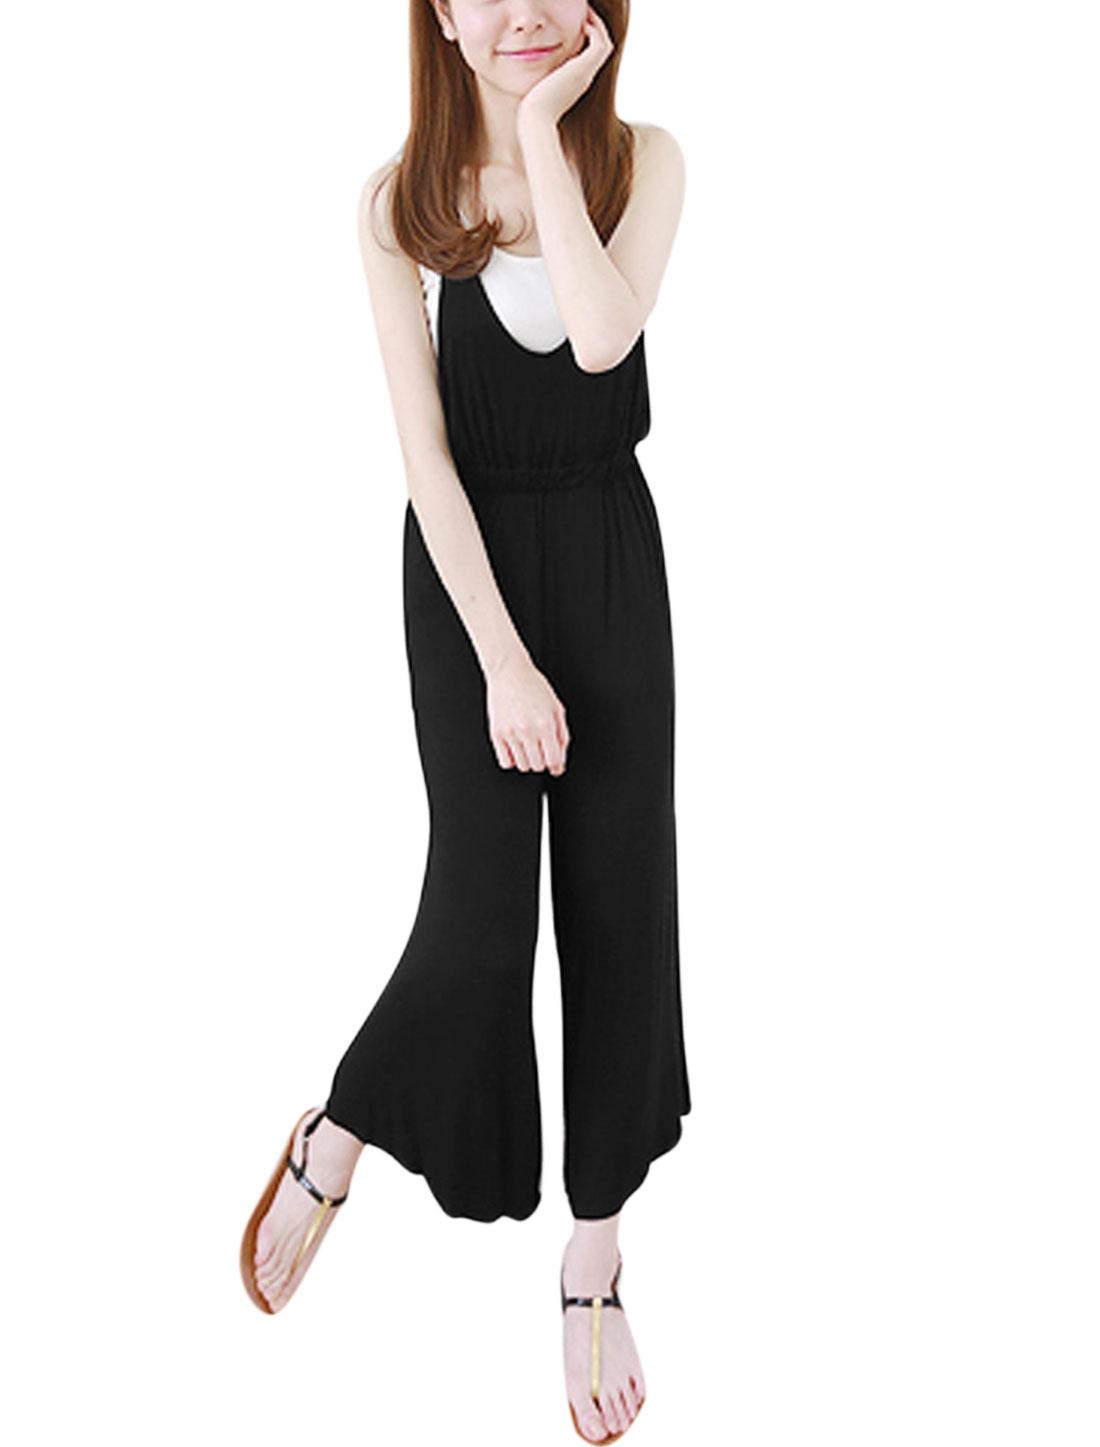 Women Halter Neck Sleeveless Elastic Waist Wide Leg Suspender Pants Black XS